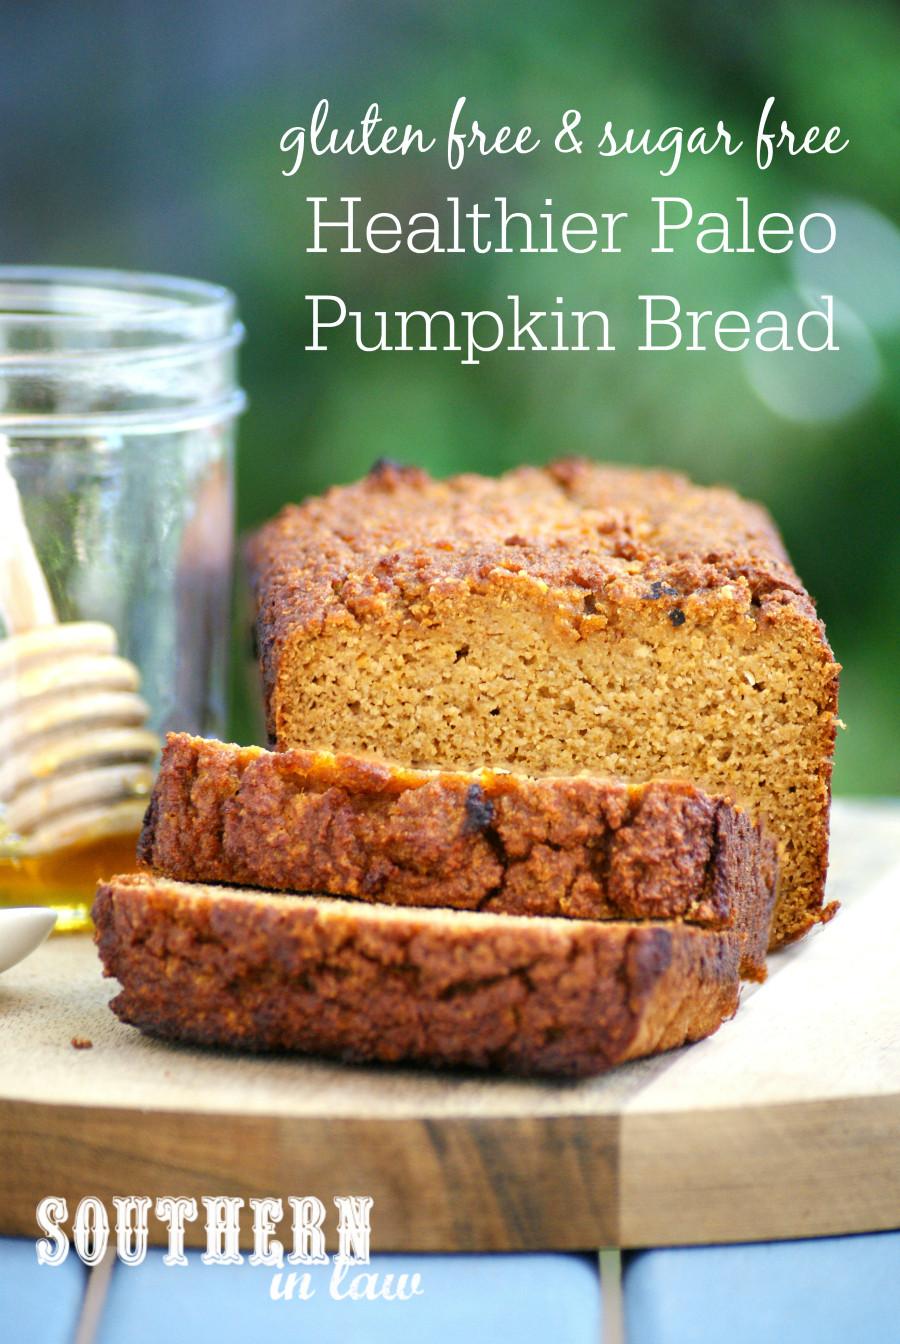 Healthy Pumpkin Bread With Applesauce  Southern In Law Recipe The Best Healthy Paleo Pumpkin Bread